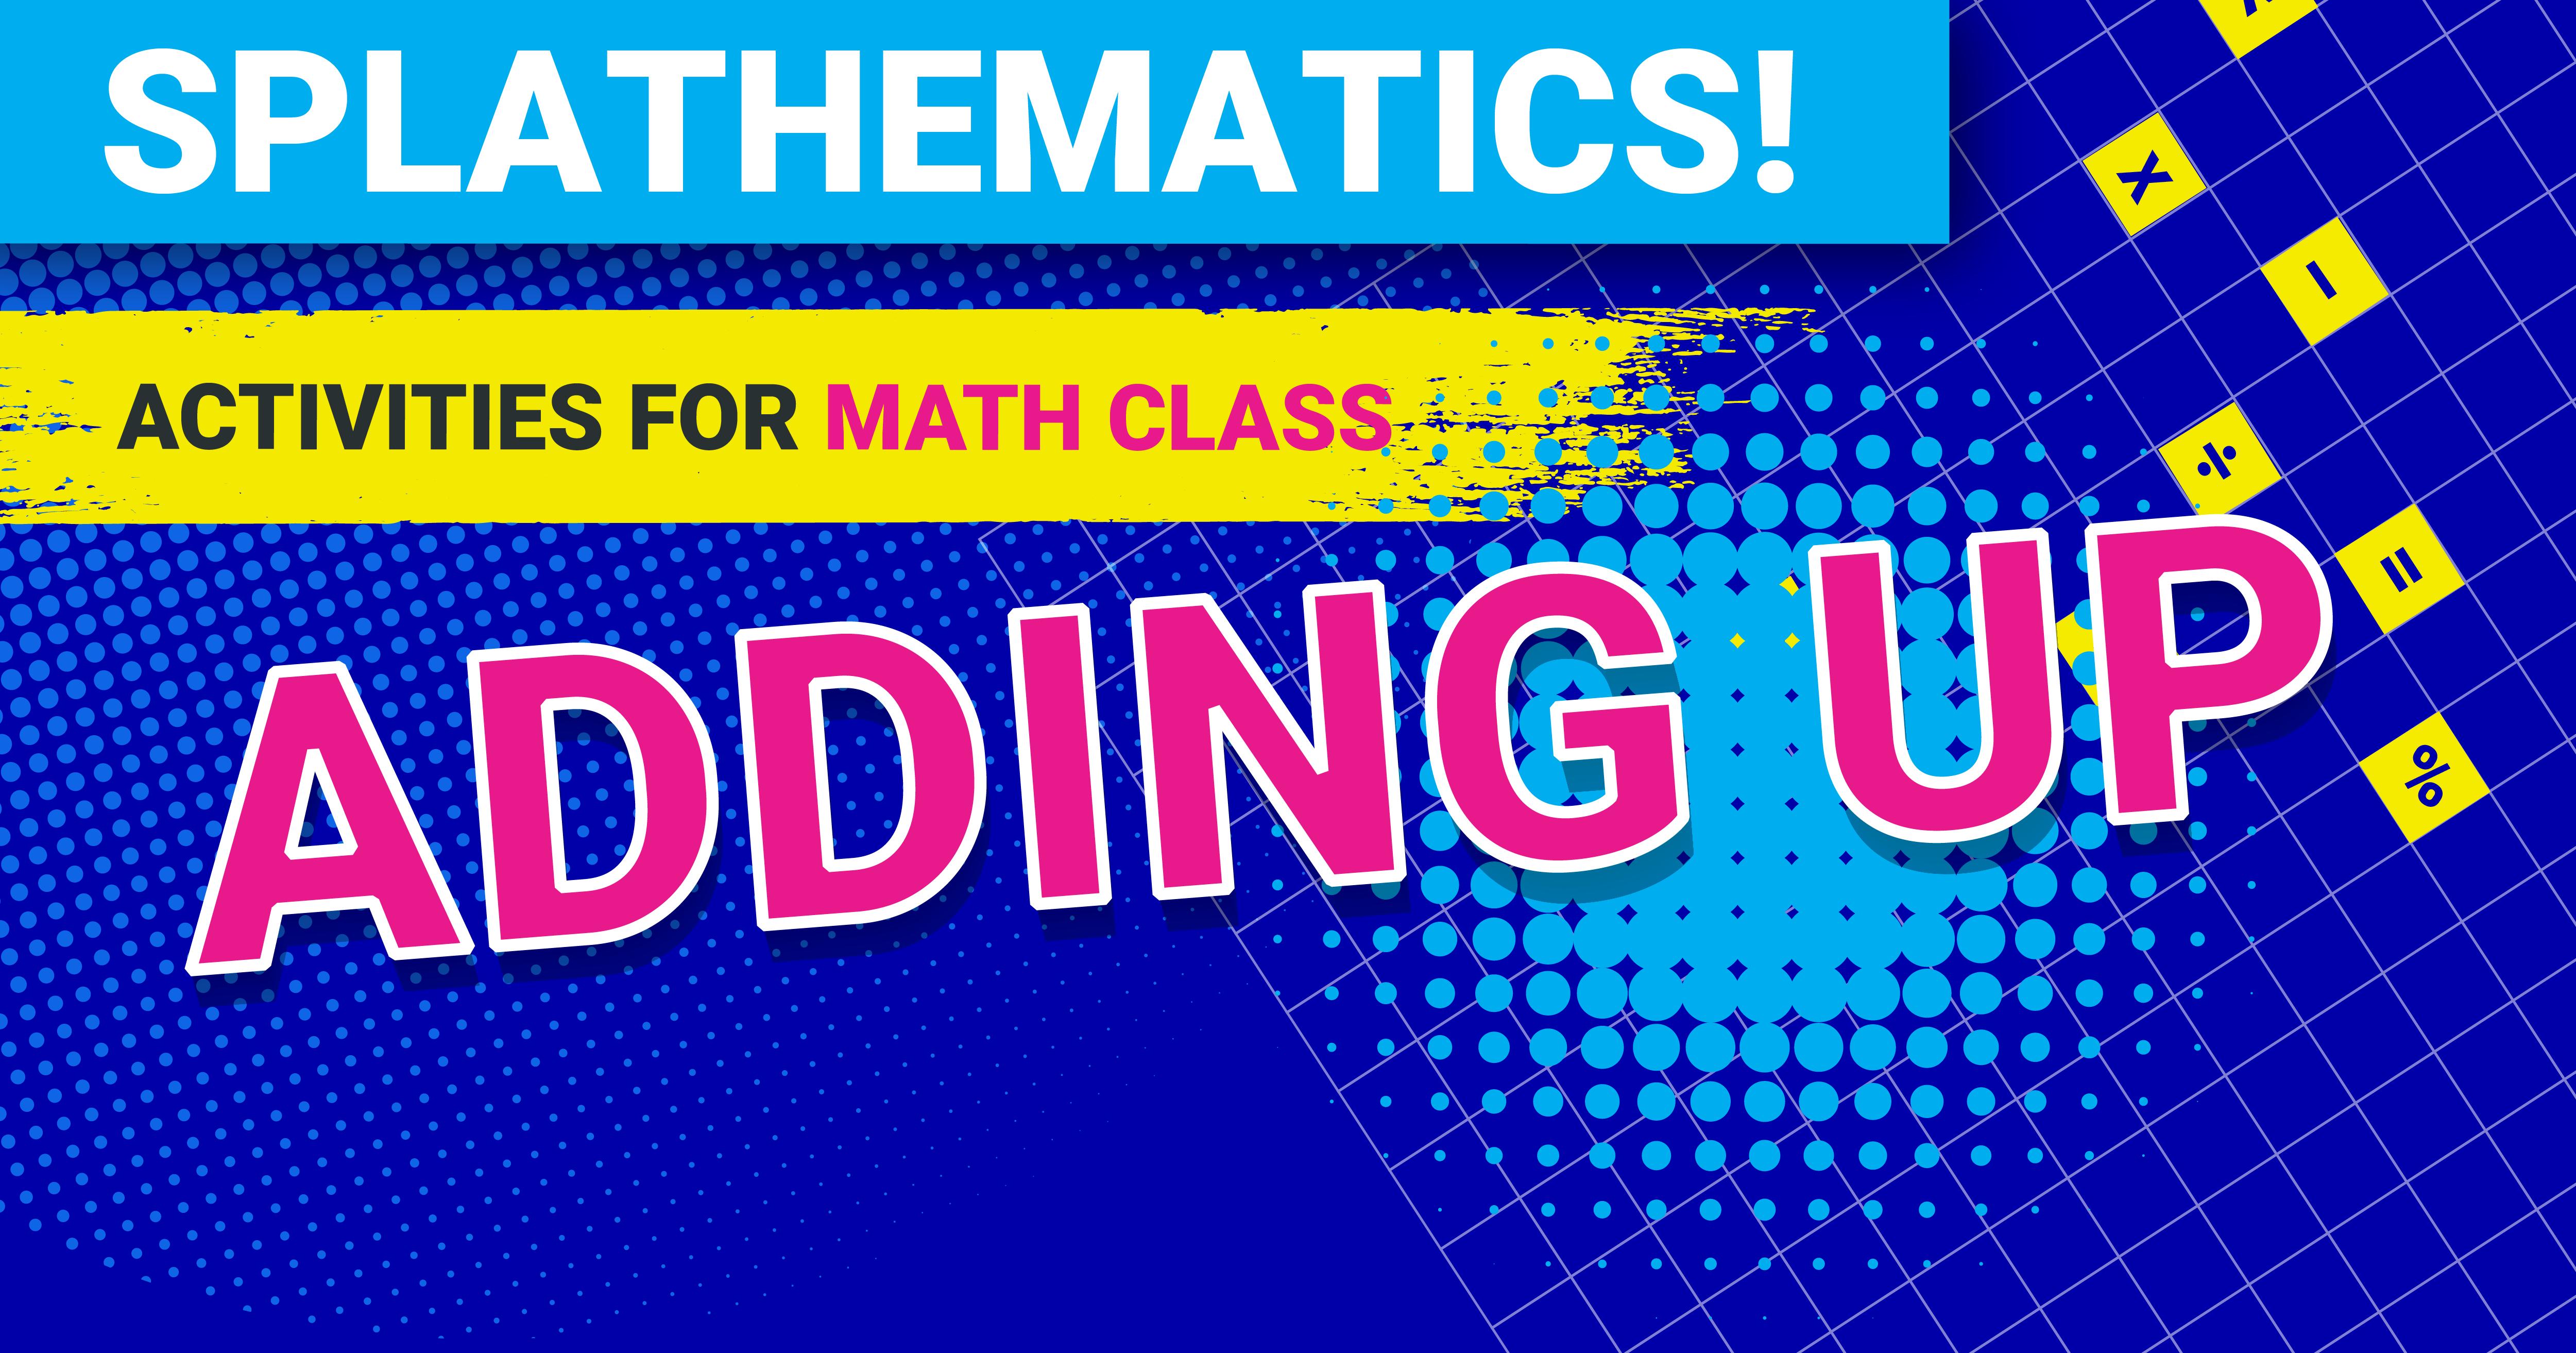 STEM Lesson Plan: Splathematics! Adding Up